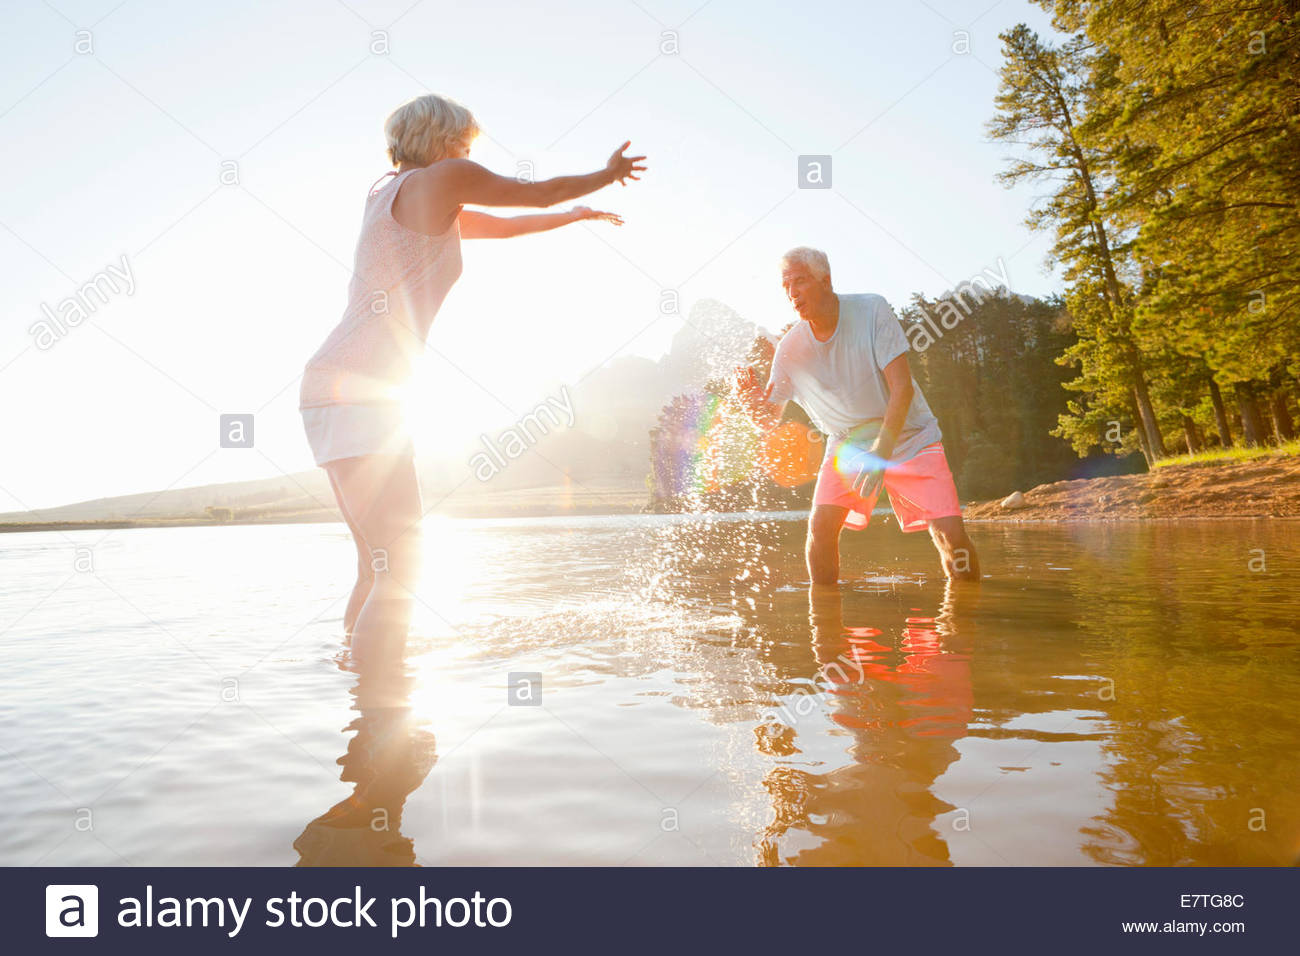 Older couple splashing each other in lake - Stock Image